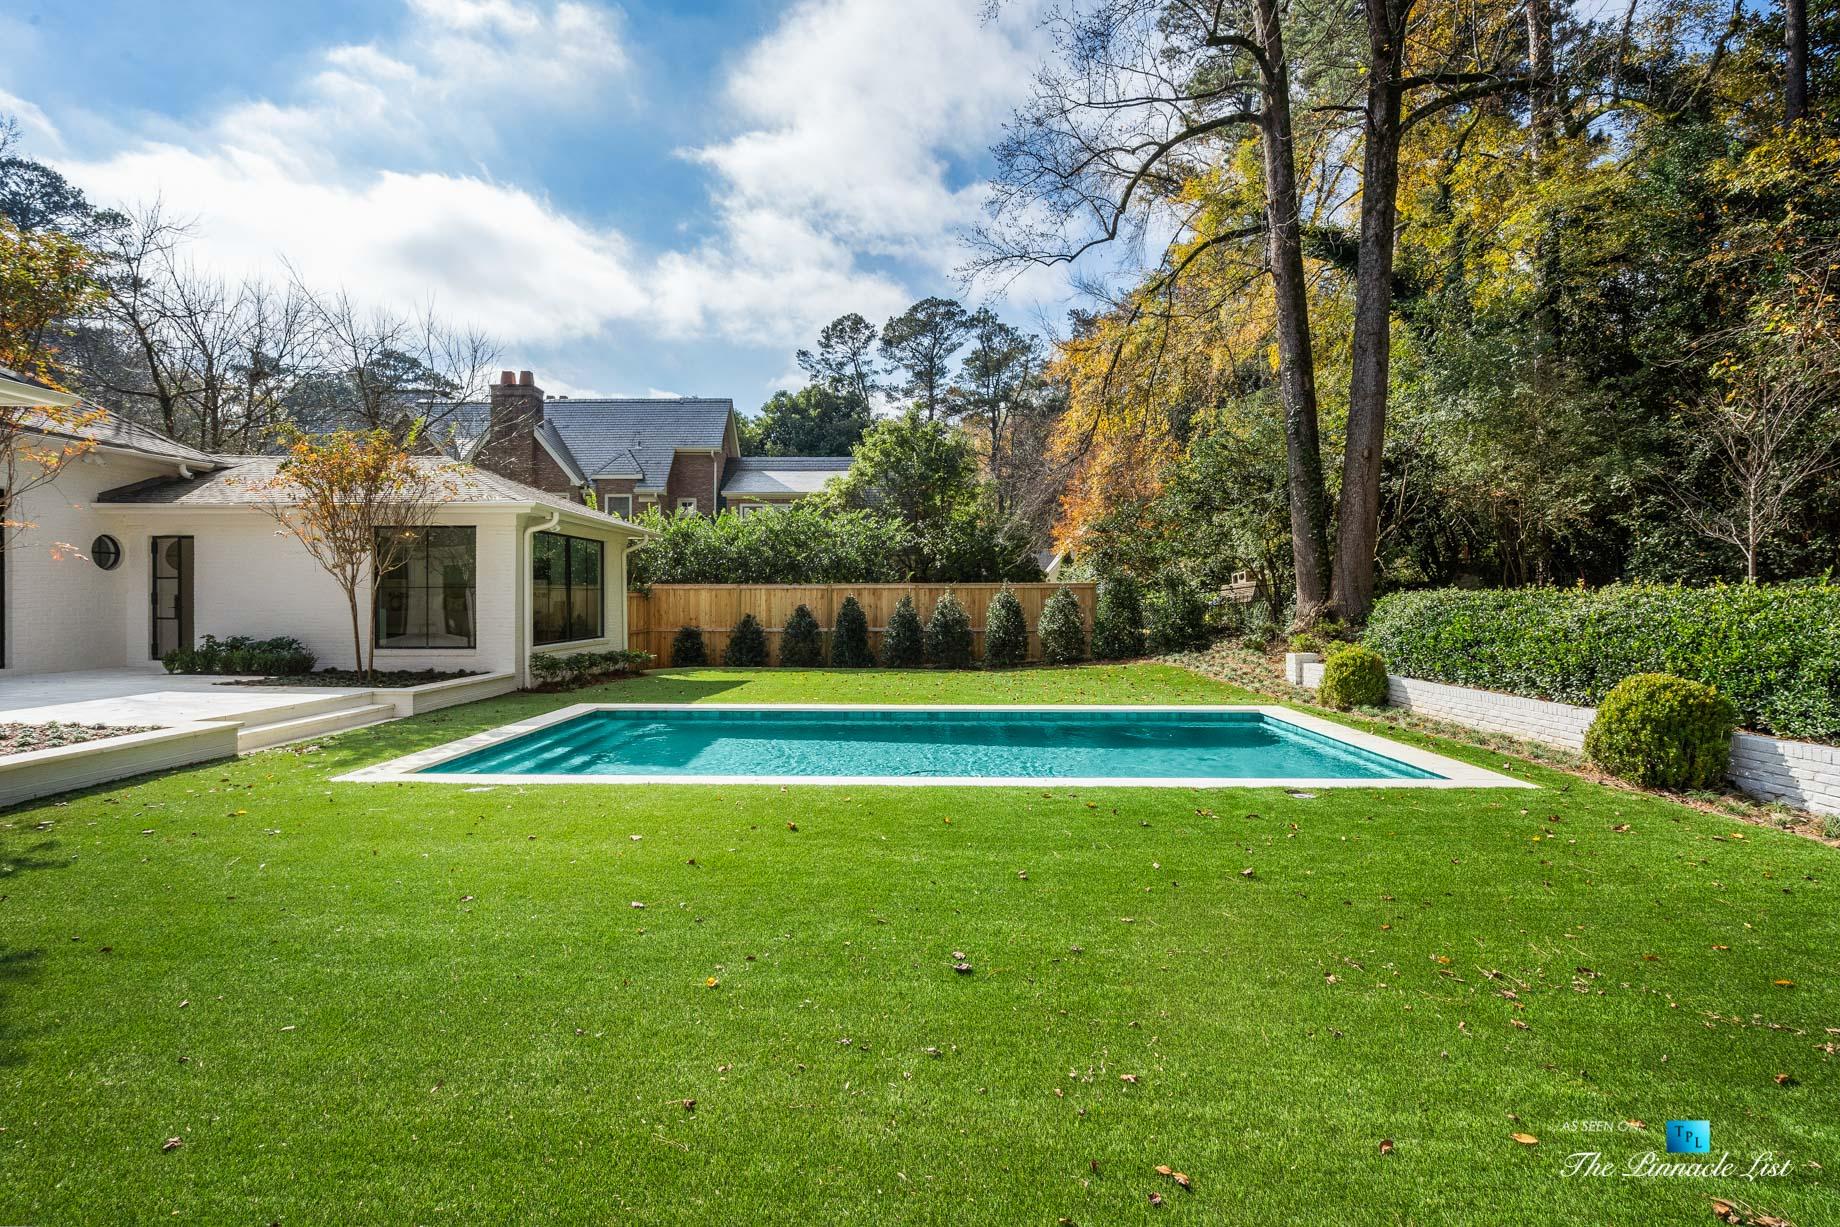 447 Valley Rd NW, Atlanta, GA, USA - Backyard Pool - Luxury Real Estate - Tuxedo Park Home